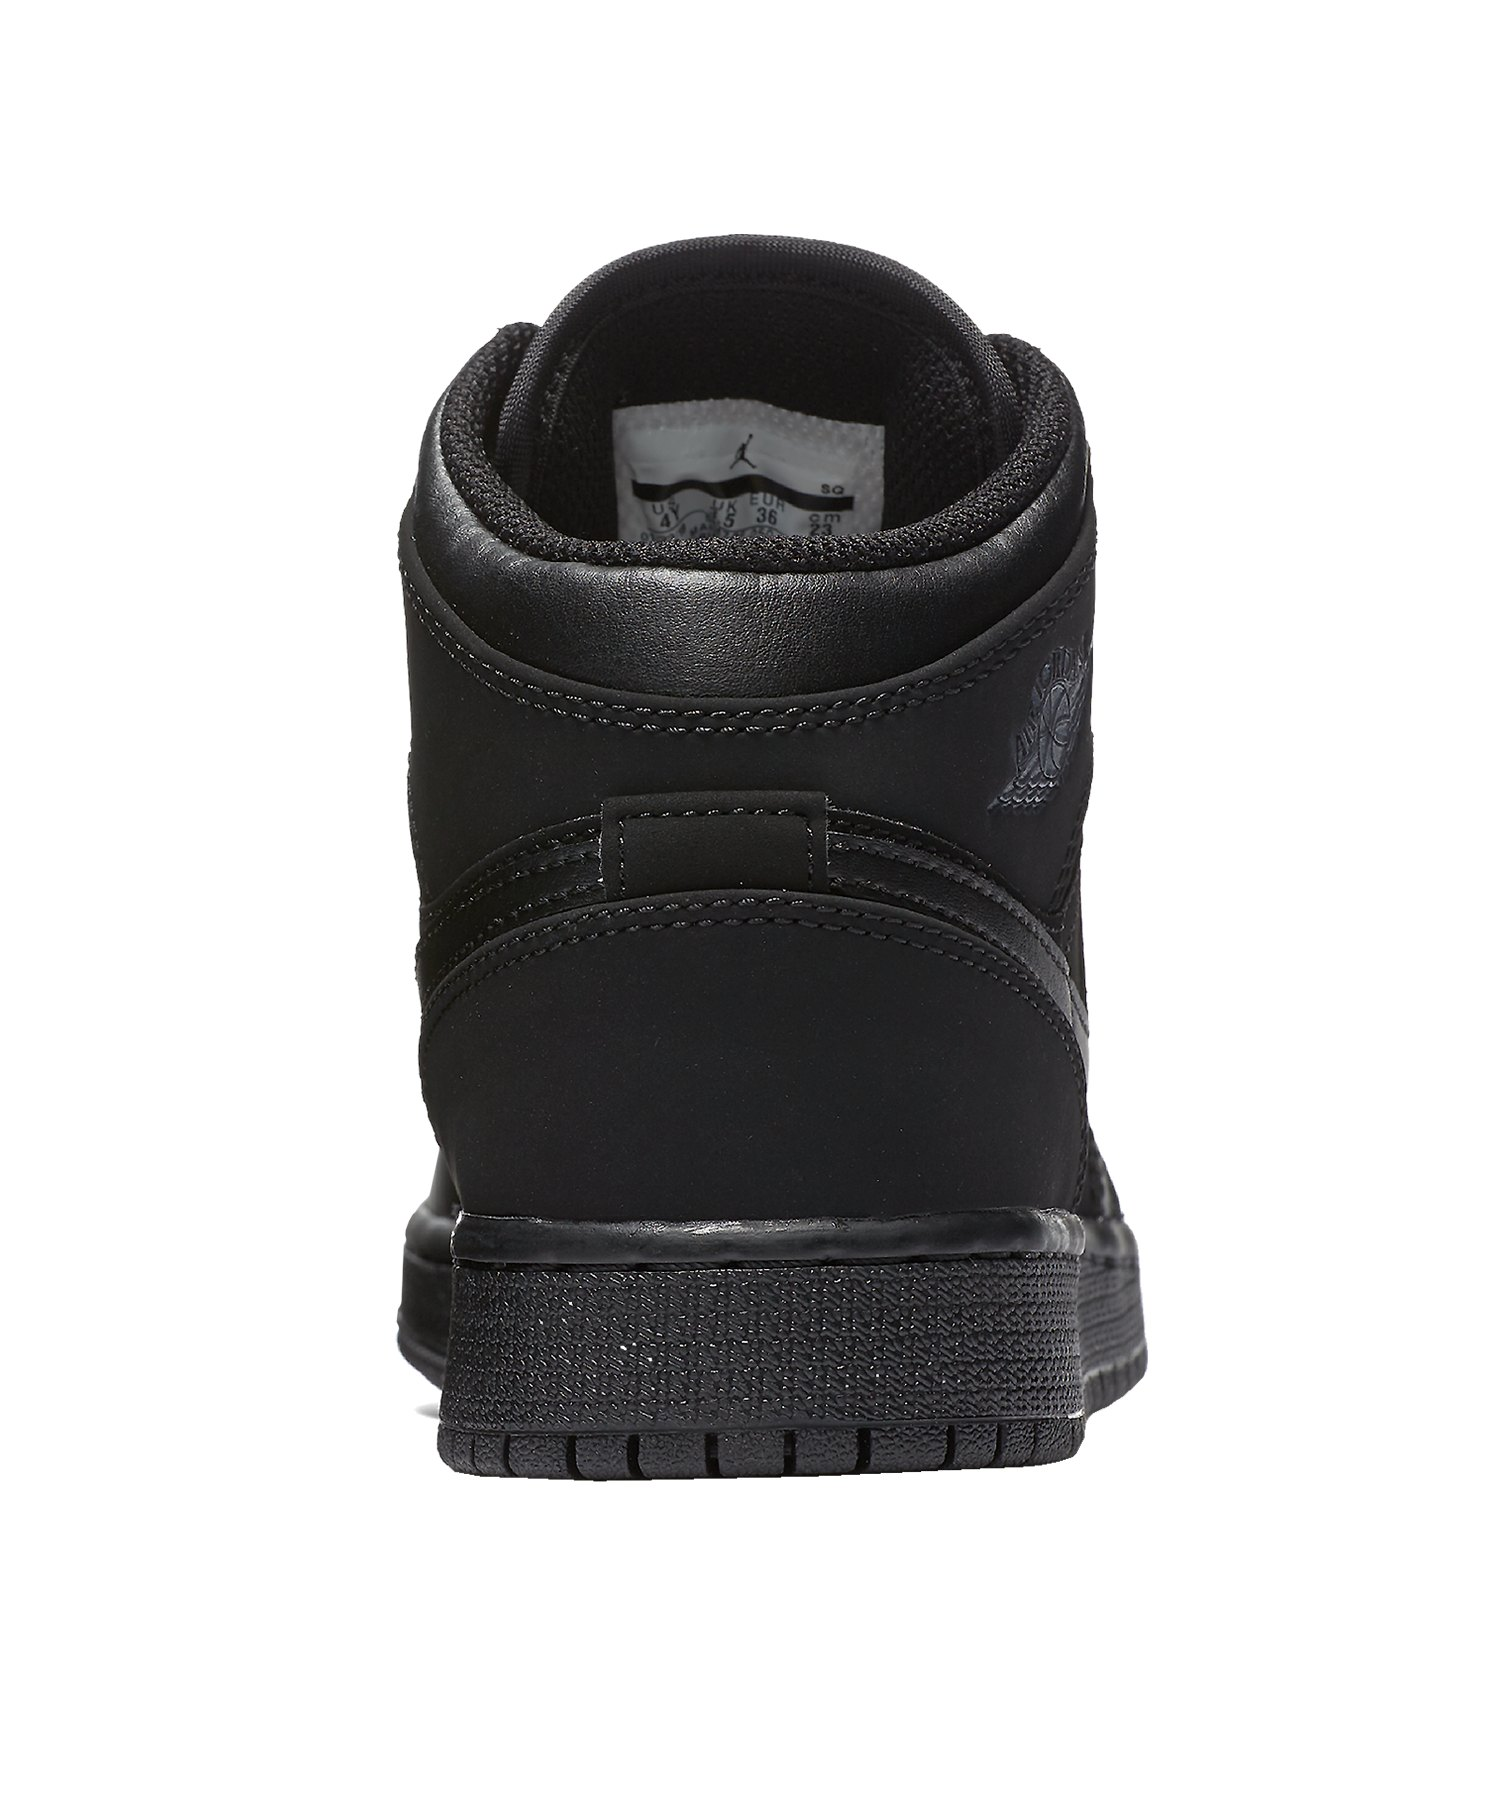 half off 60562 dac8d ... Jordan 1 Mid Sneaker Kids Schwarz Grau F050 - schwarz ...